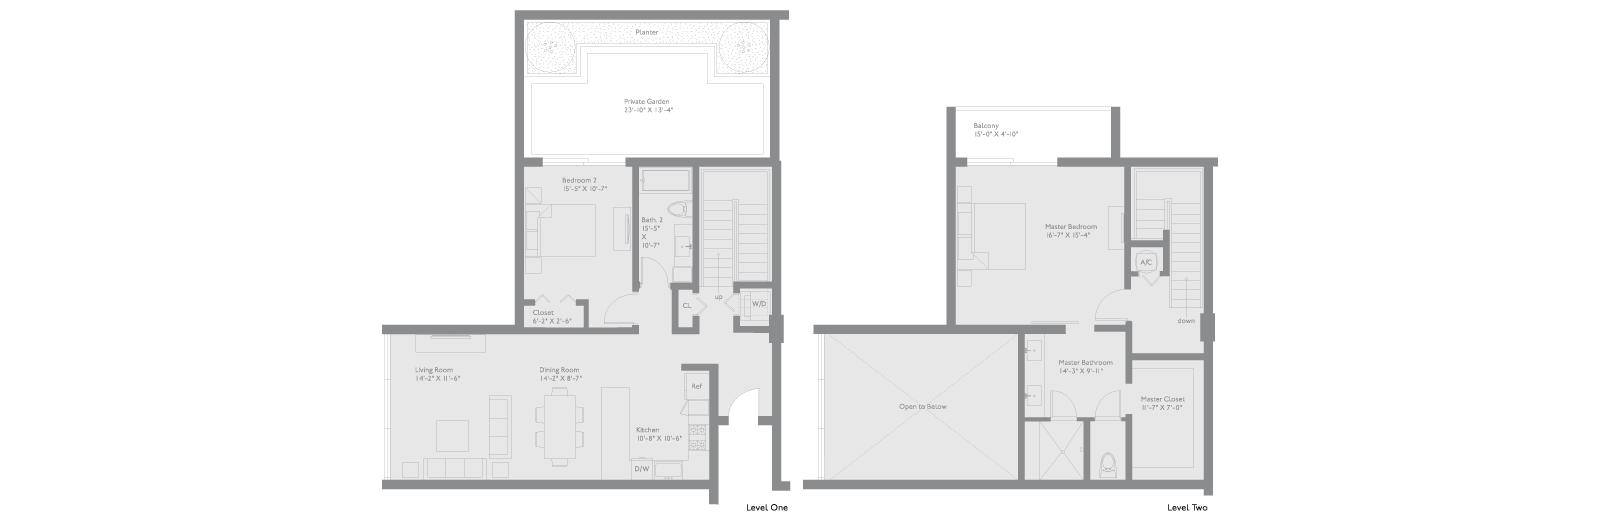 Arbor Floor Plan A 12 15 17